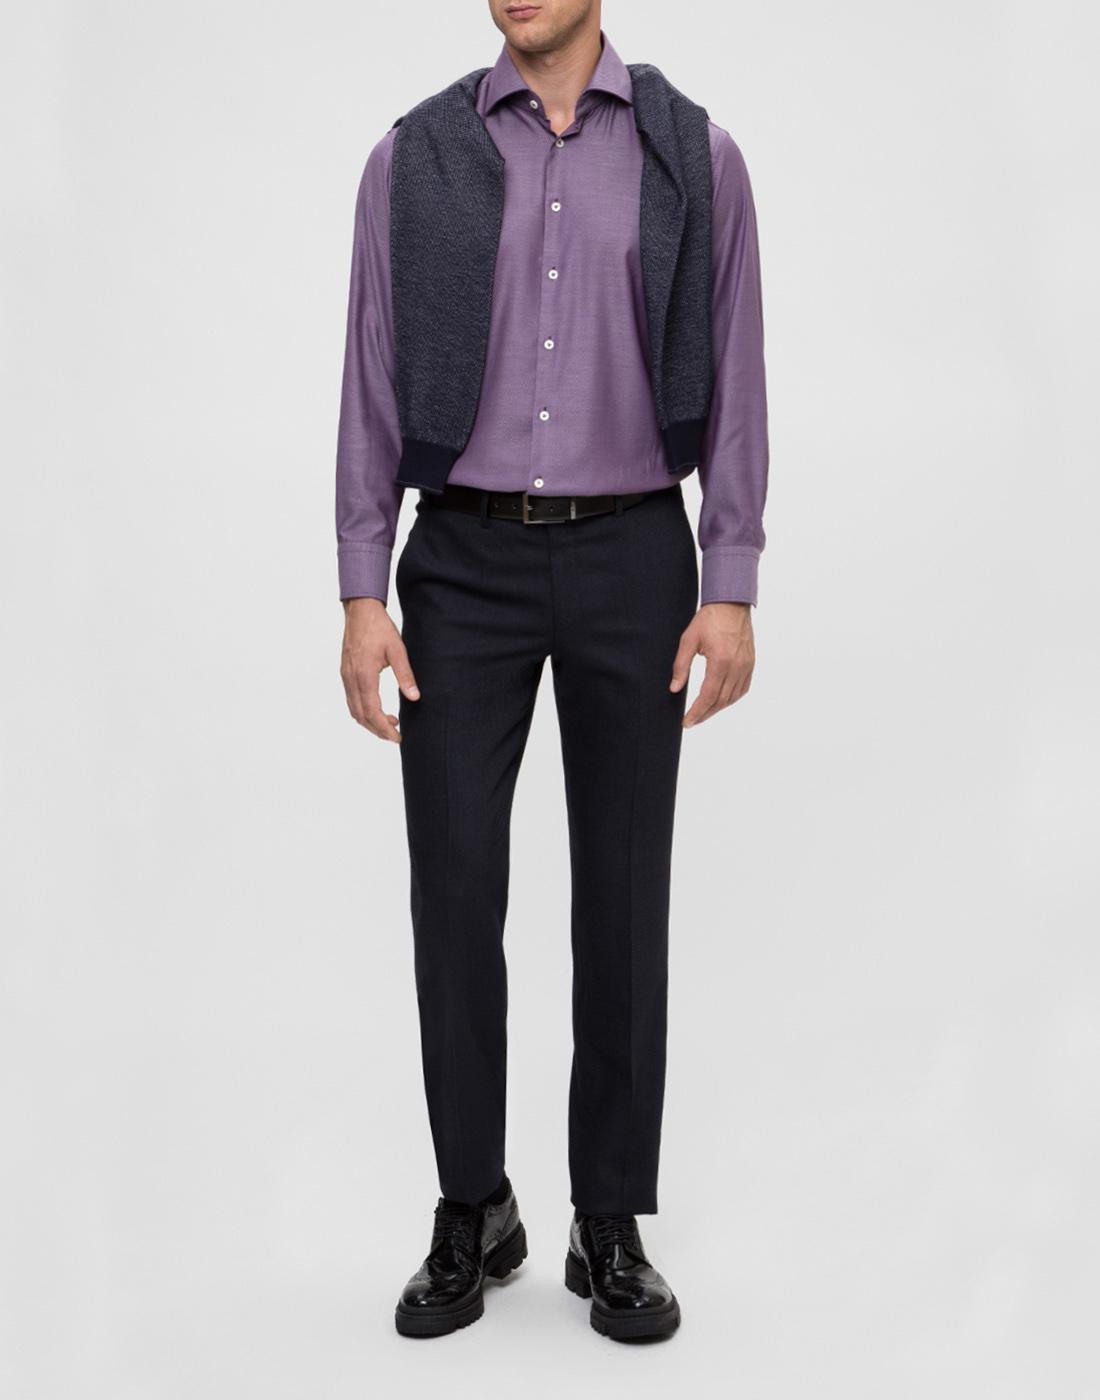 Мужская сиреневая рубашка Van Laack S151377/670-5